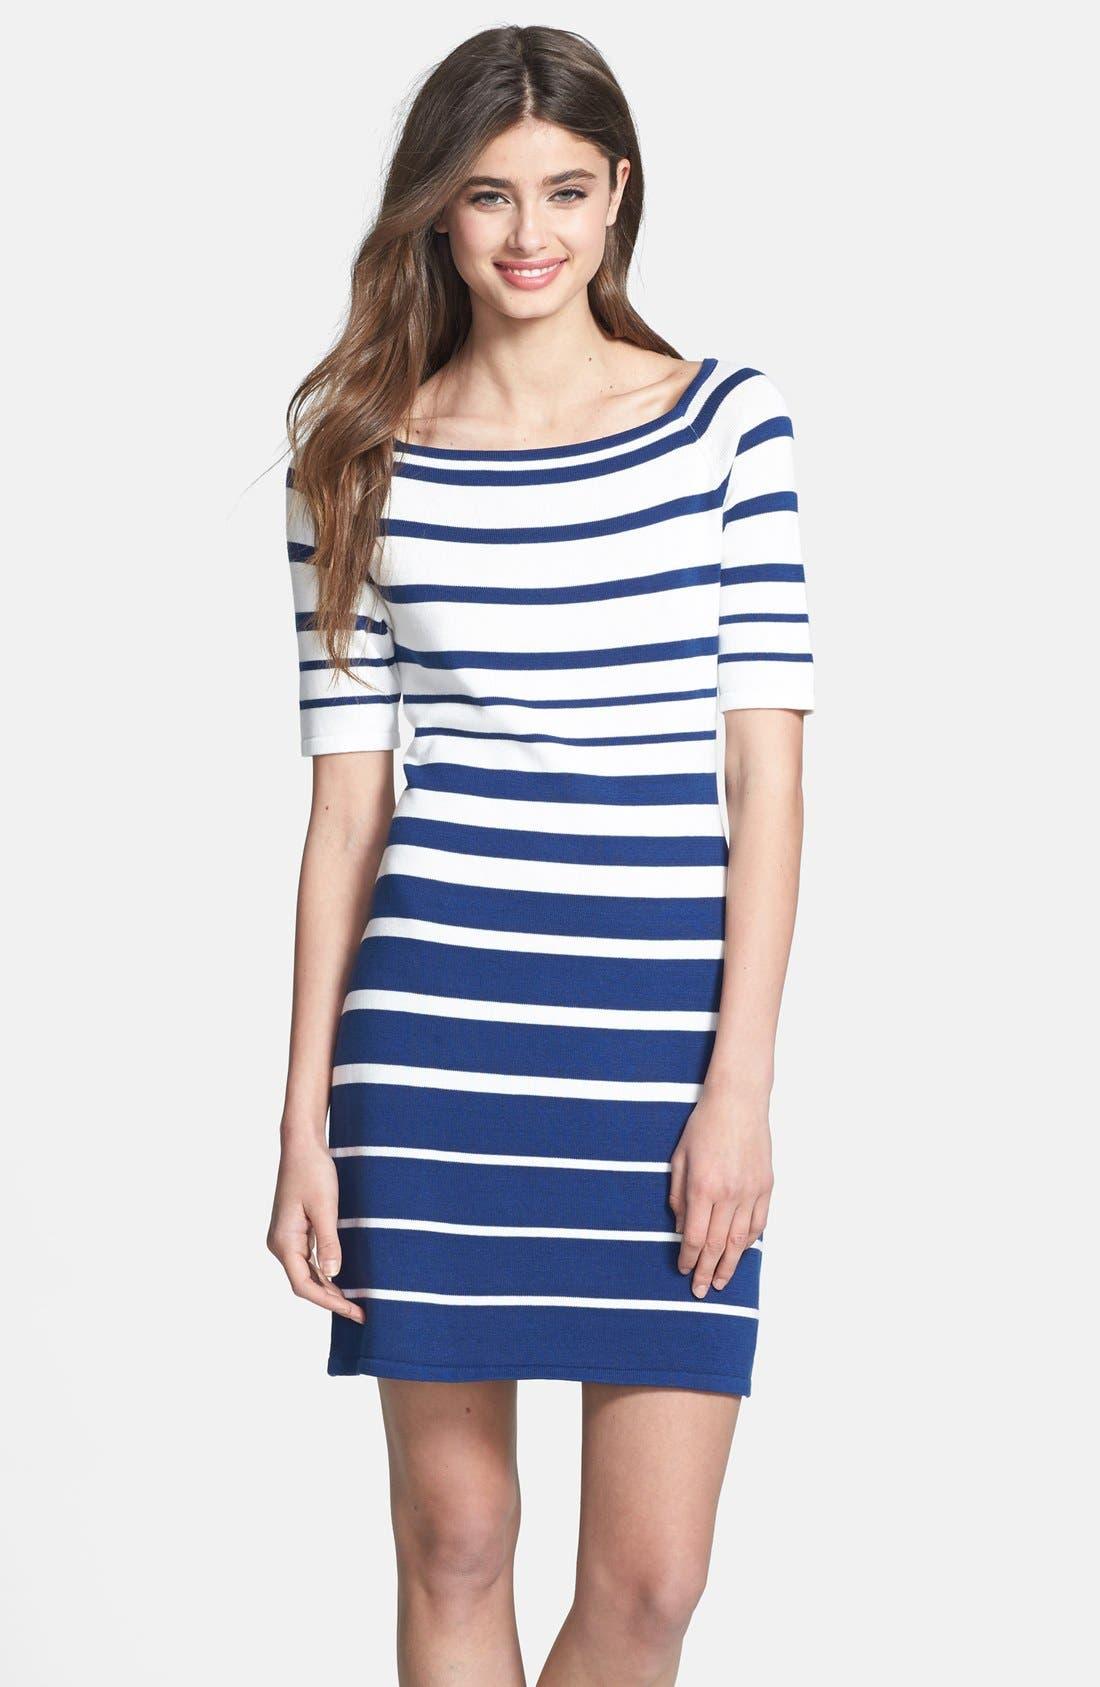 Main Image - Trina Trina Turk 'Olive' Stripe Sweater Dress